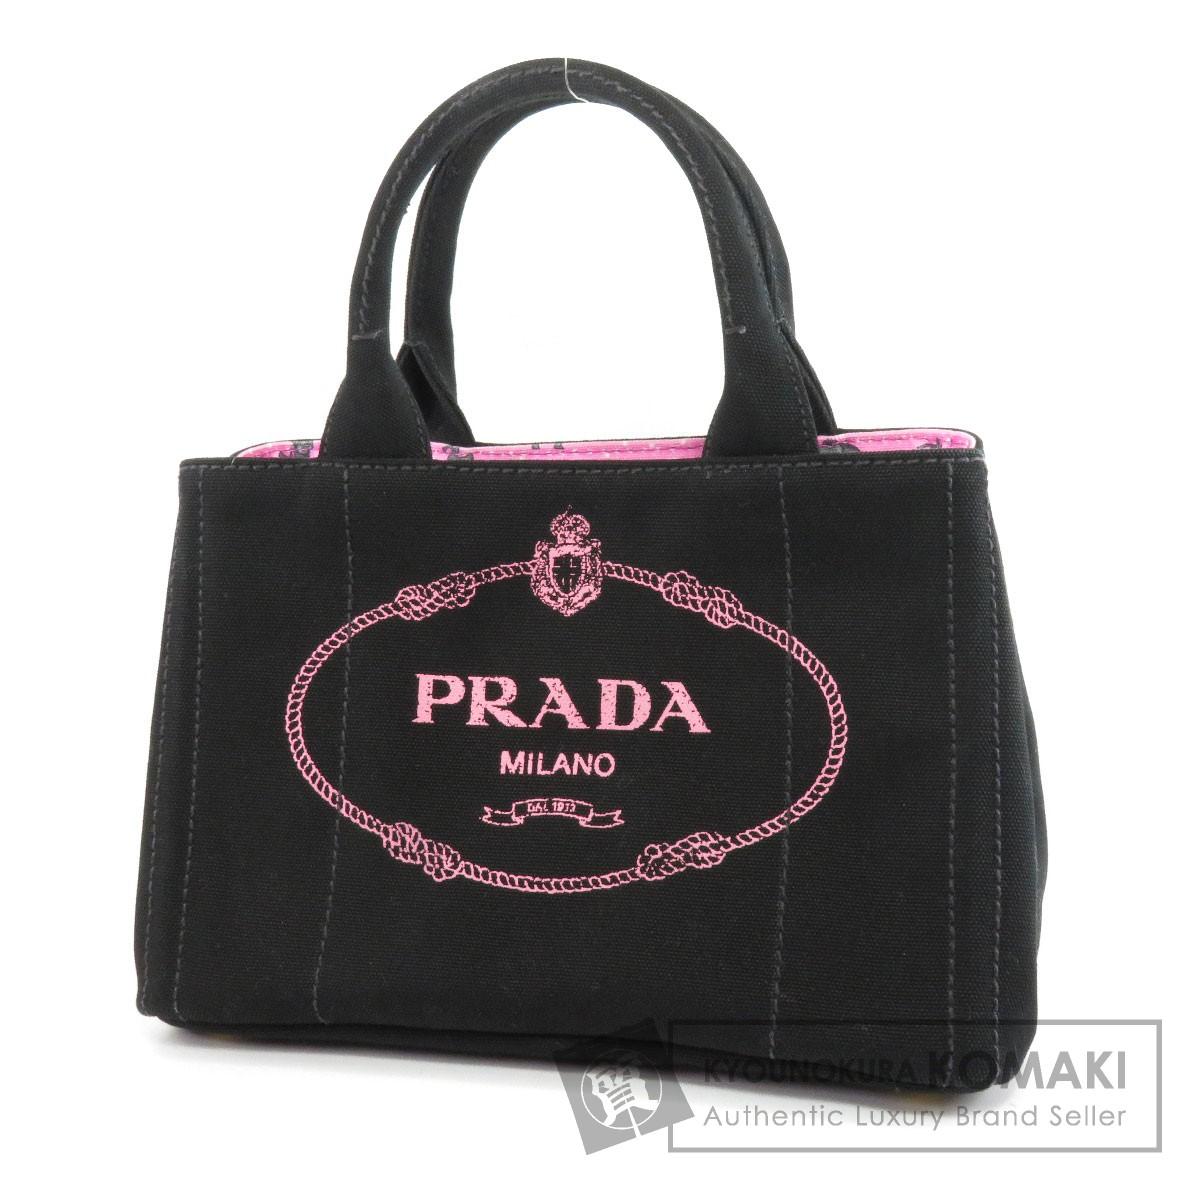 PRADA 1BG439 カナパ ミニ 2WAY トートバッグ キャンバス レディース 【中古】【プラダ】